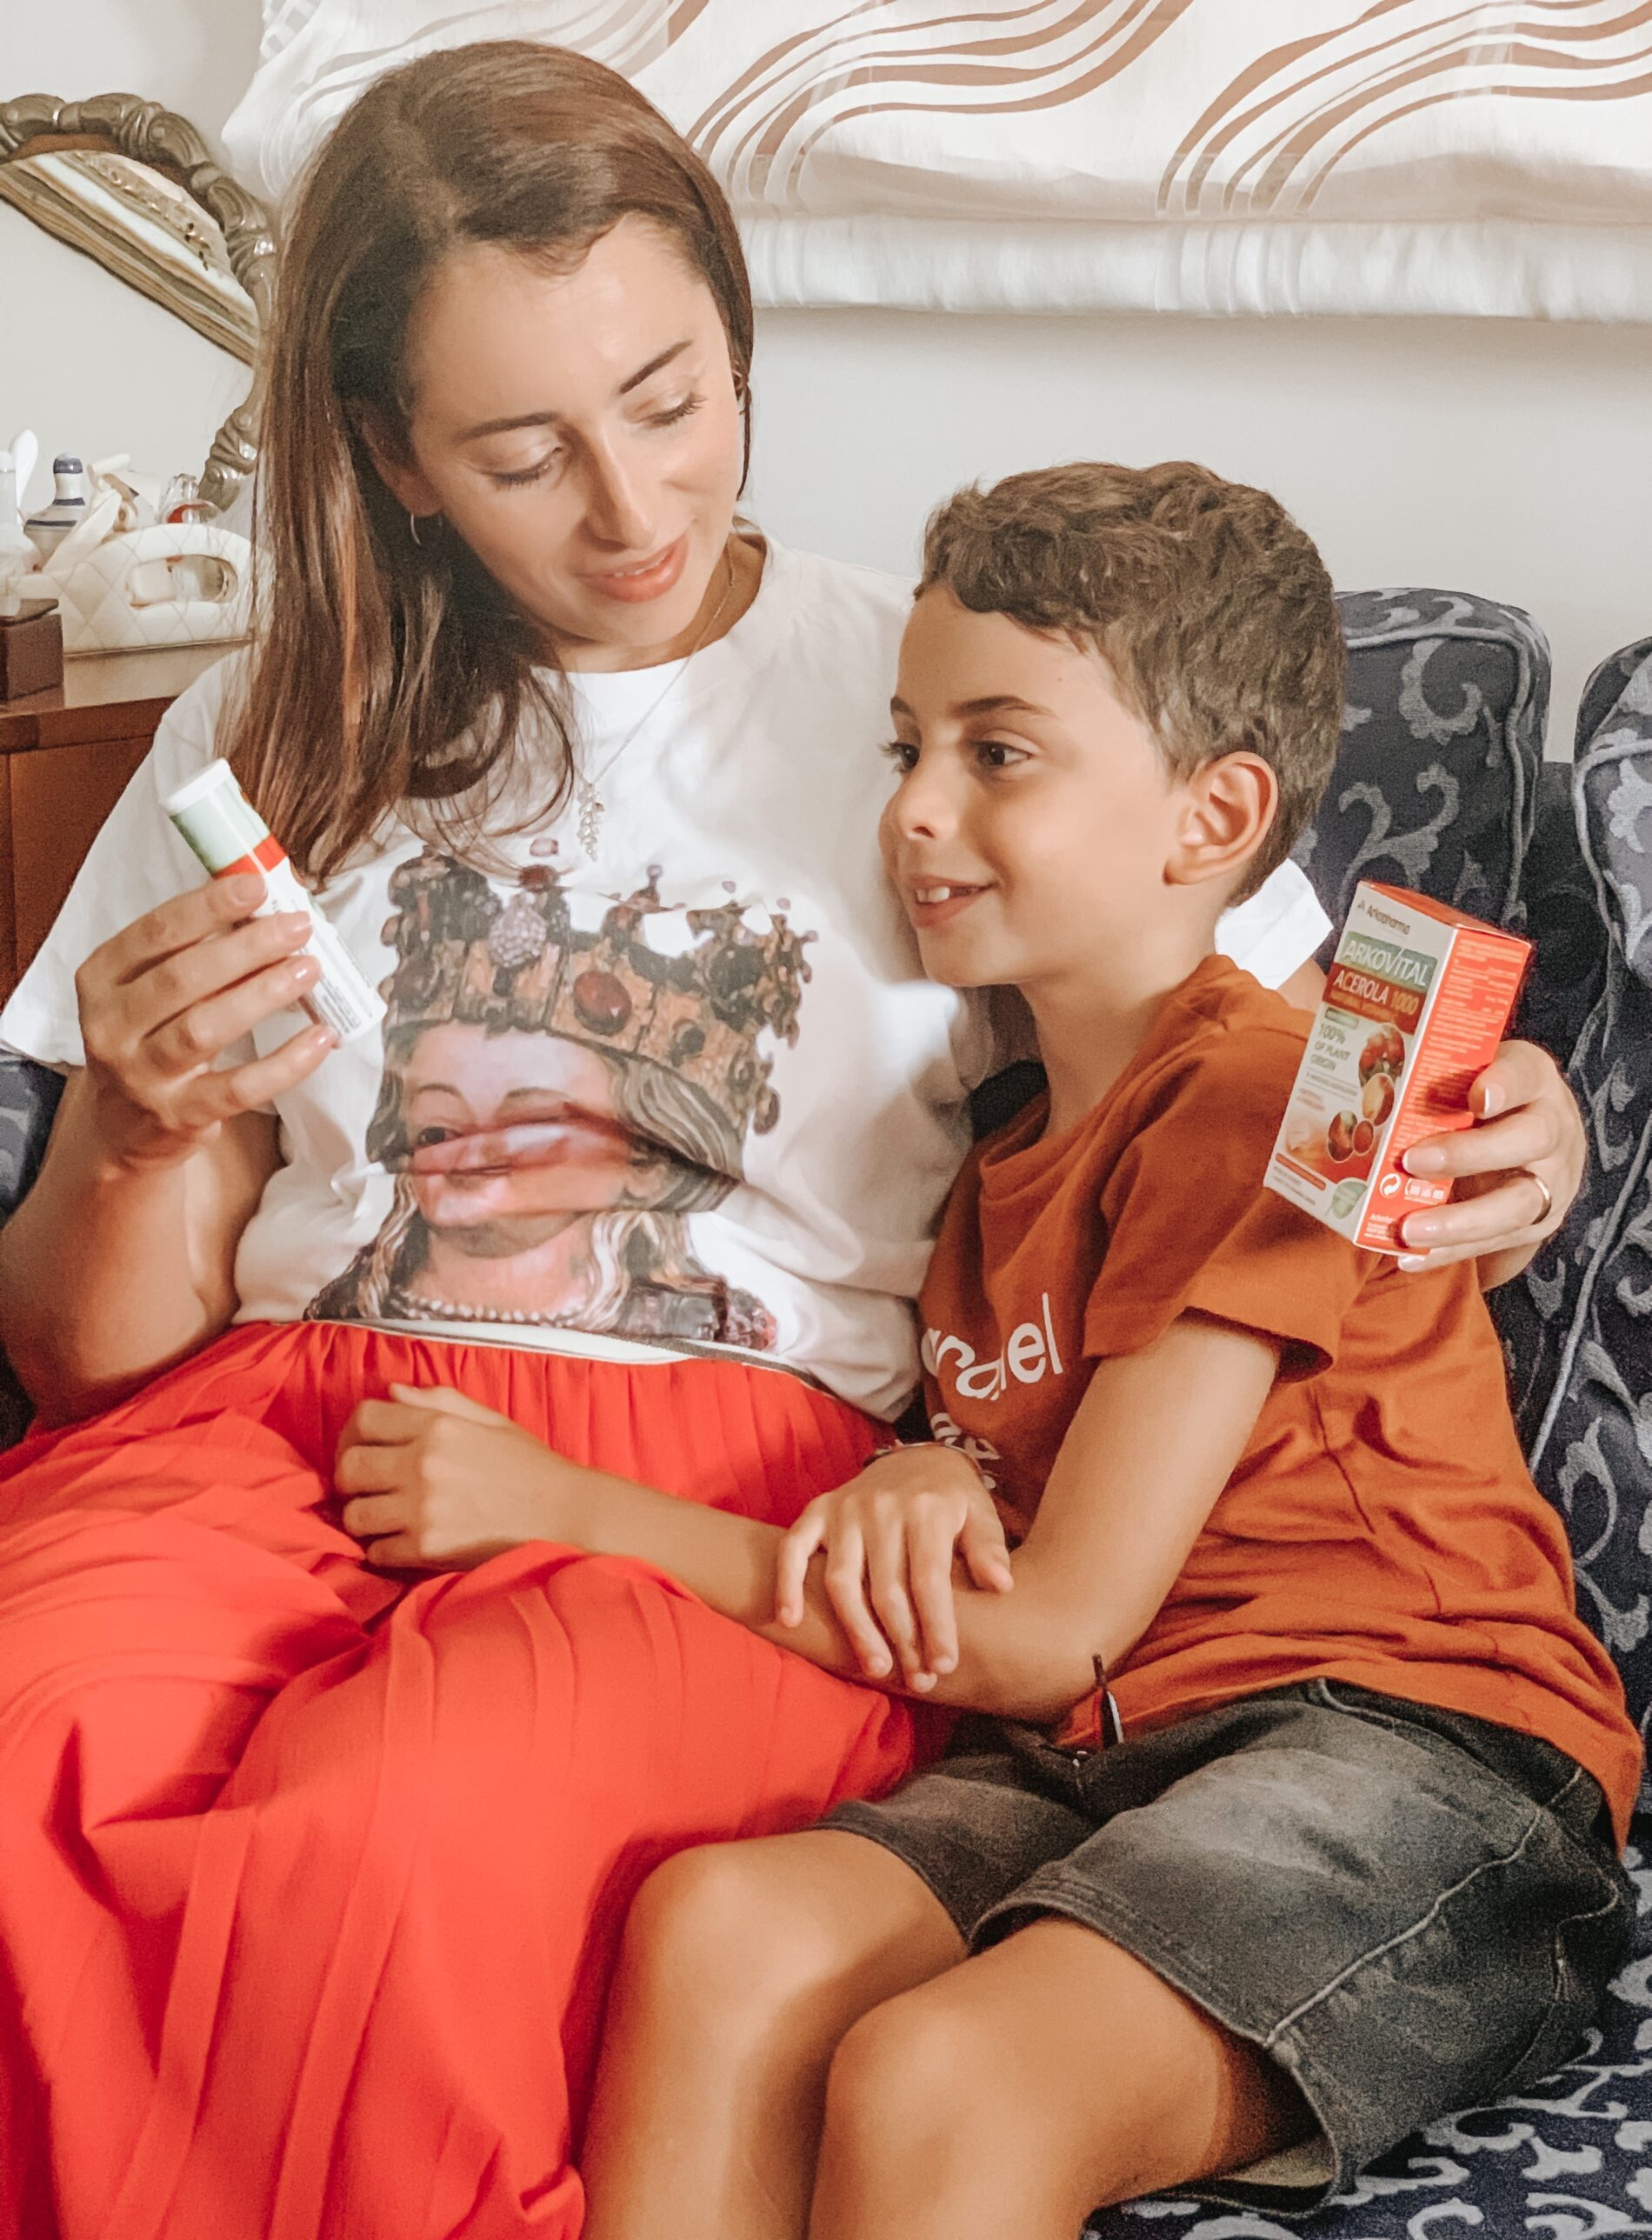 assunzione vitamina C per i bambini